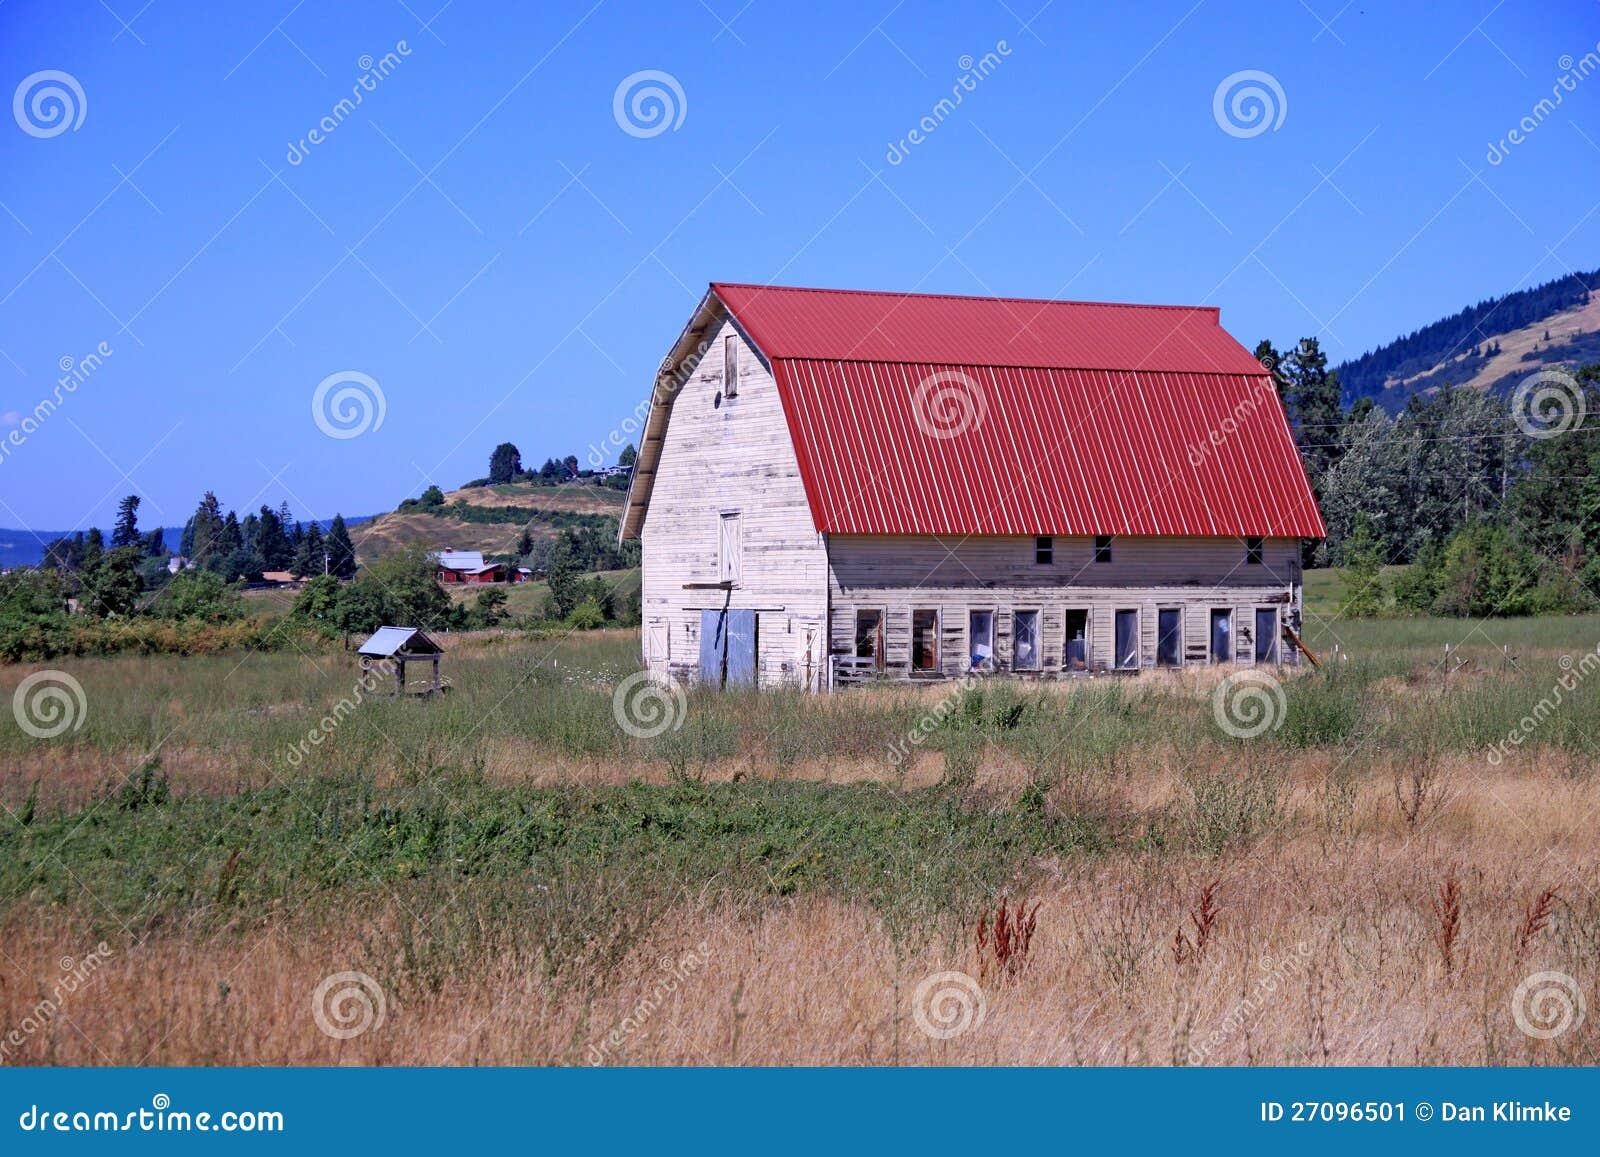 Red Oregon Barn Stock Image Image 27096501